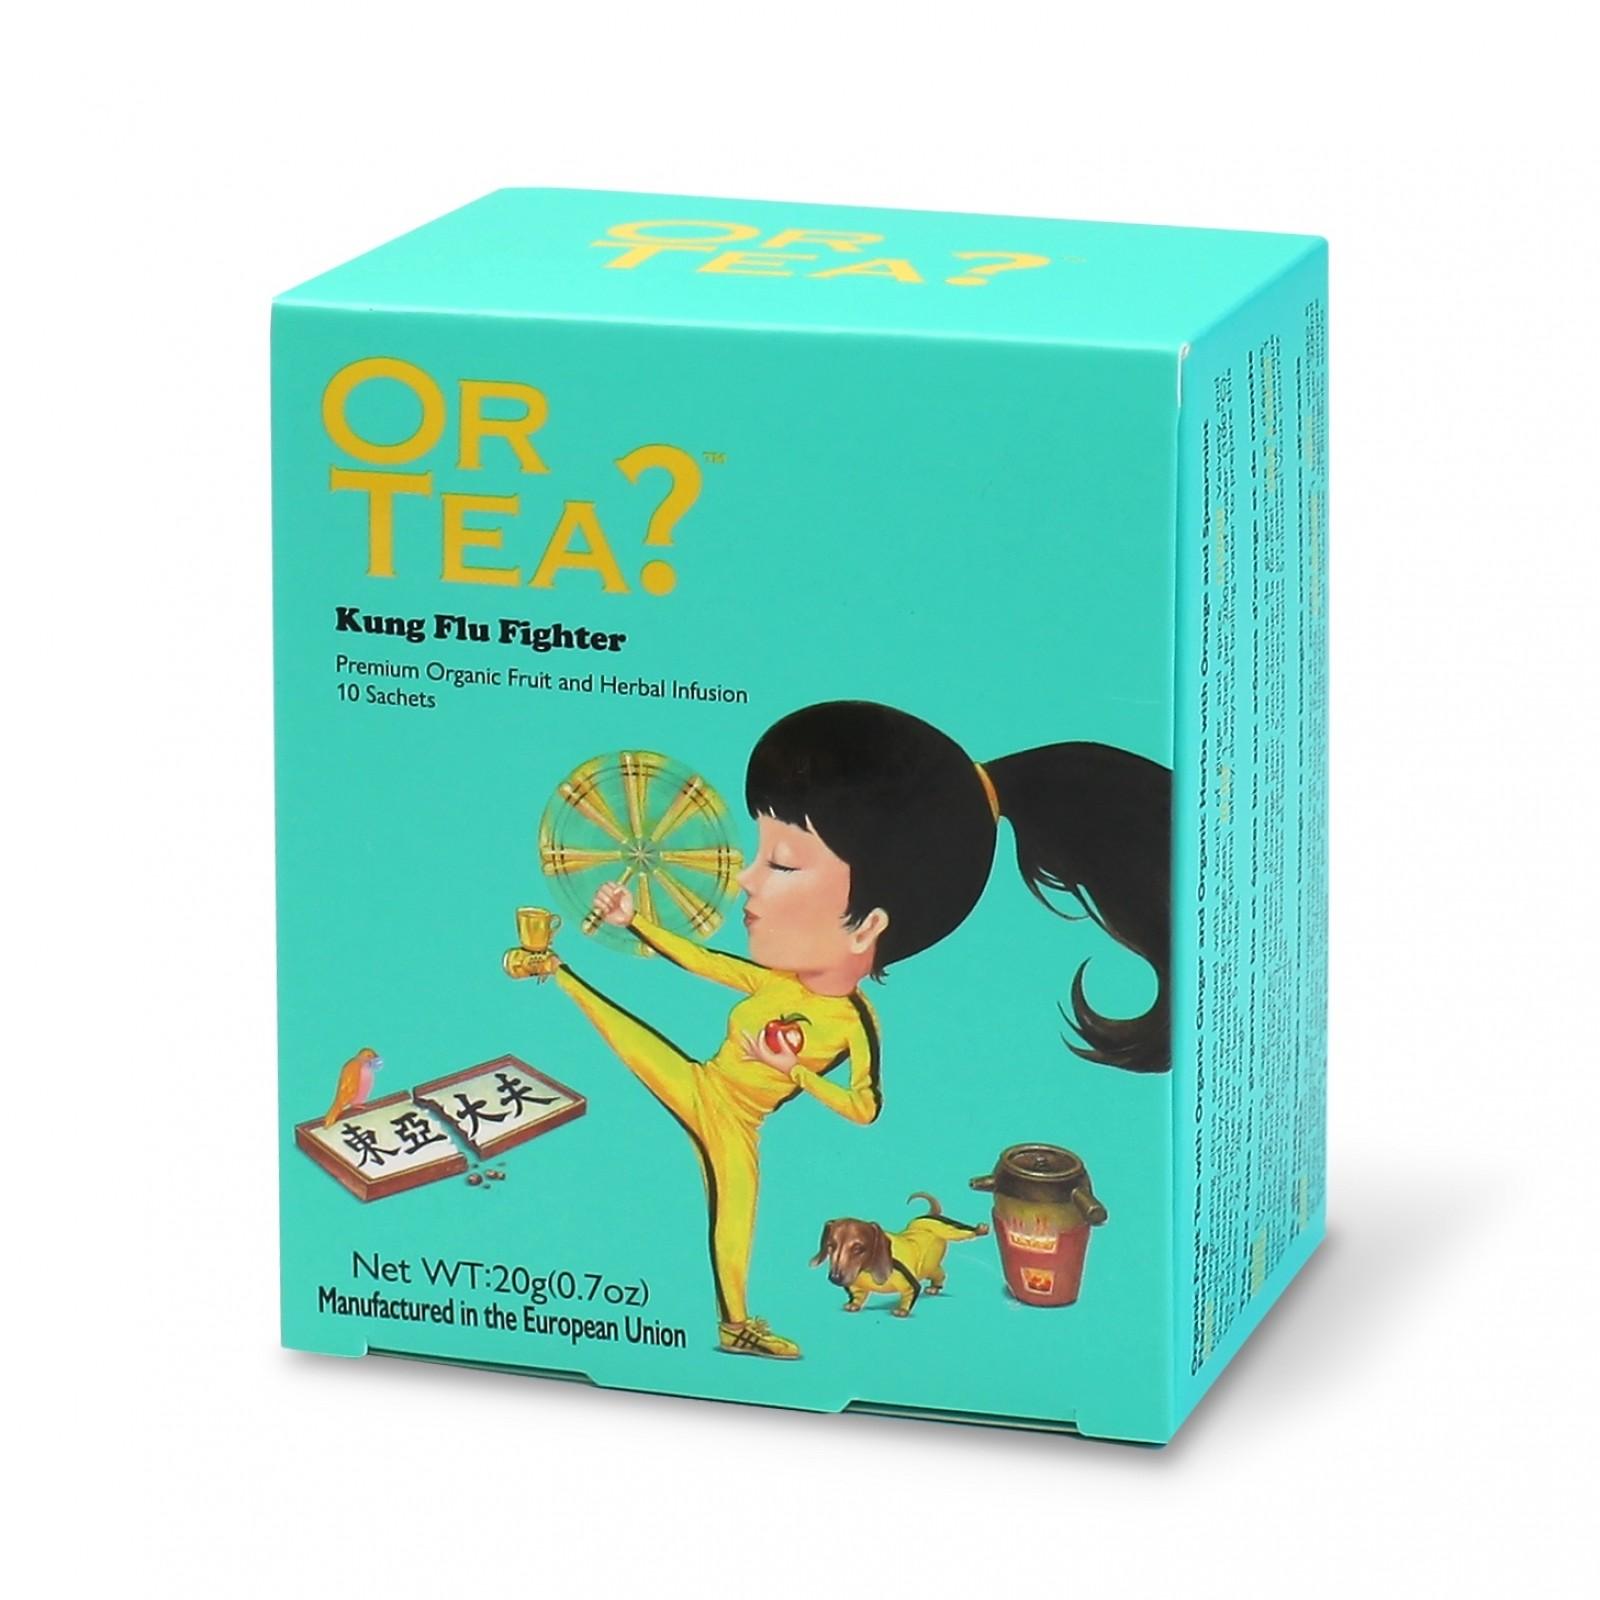 Kung Flu Fighter - Groene thee met kruiden